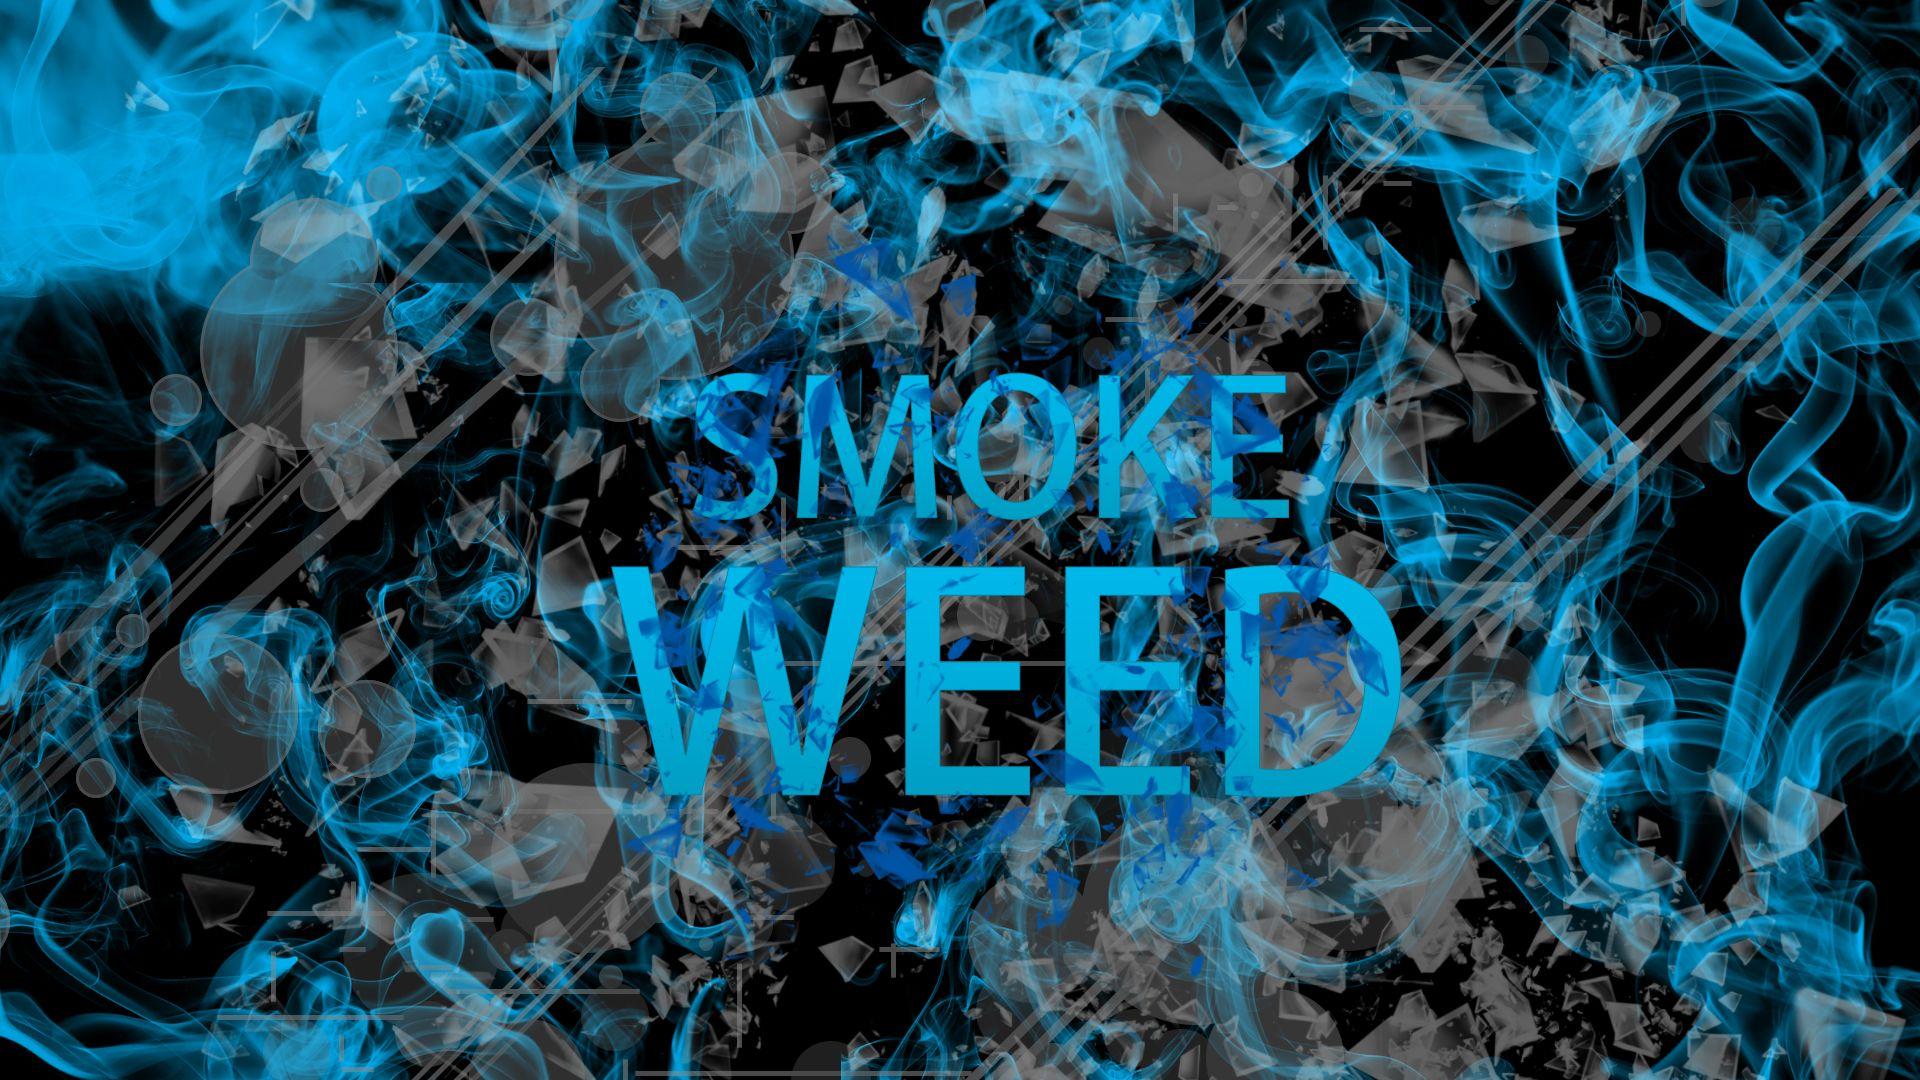 Weed Smoke Backgrounds Hd Wallpaper Desktop Free Download 1920x1080